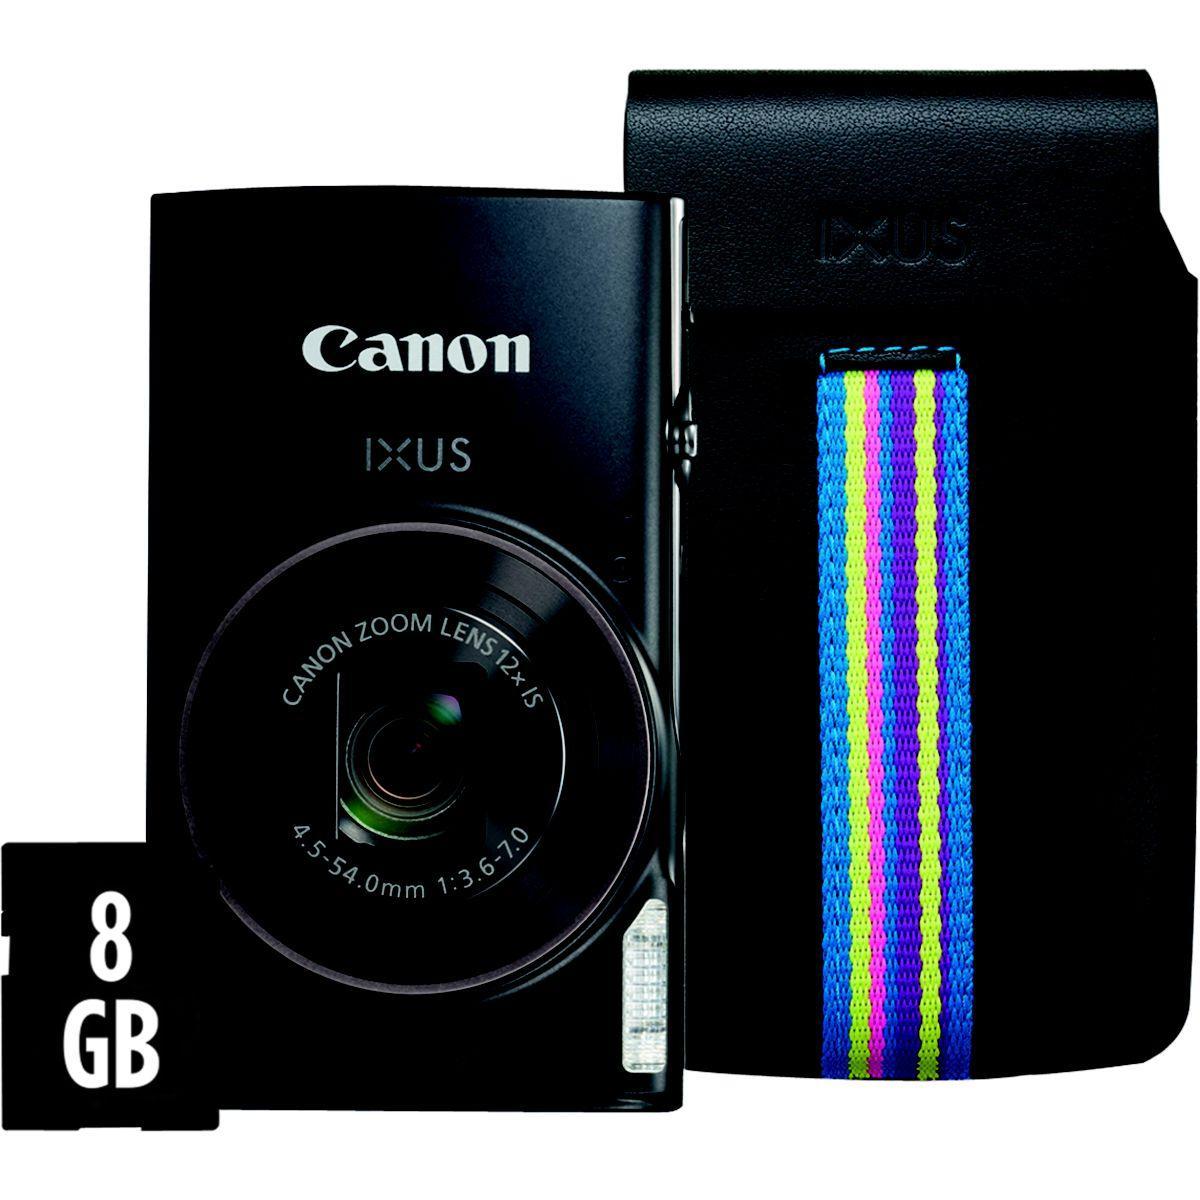 Appareil photo compact canon ixus 285 hs noir + etui + sd 8go - livraison offerte : code livphoto (photo)